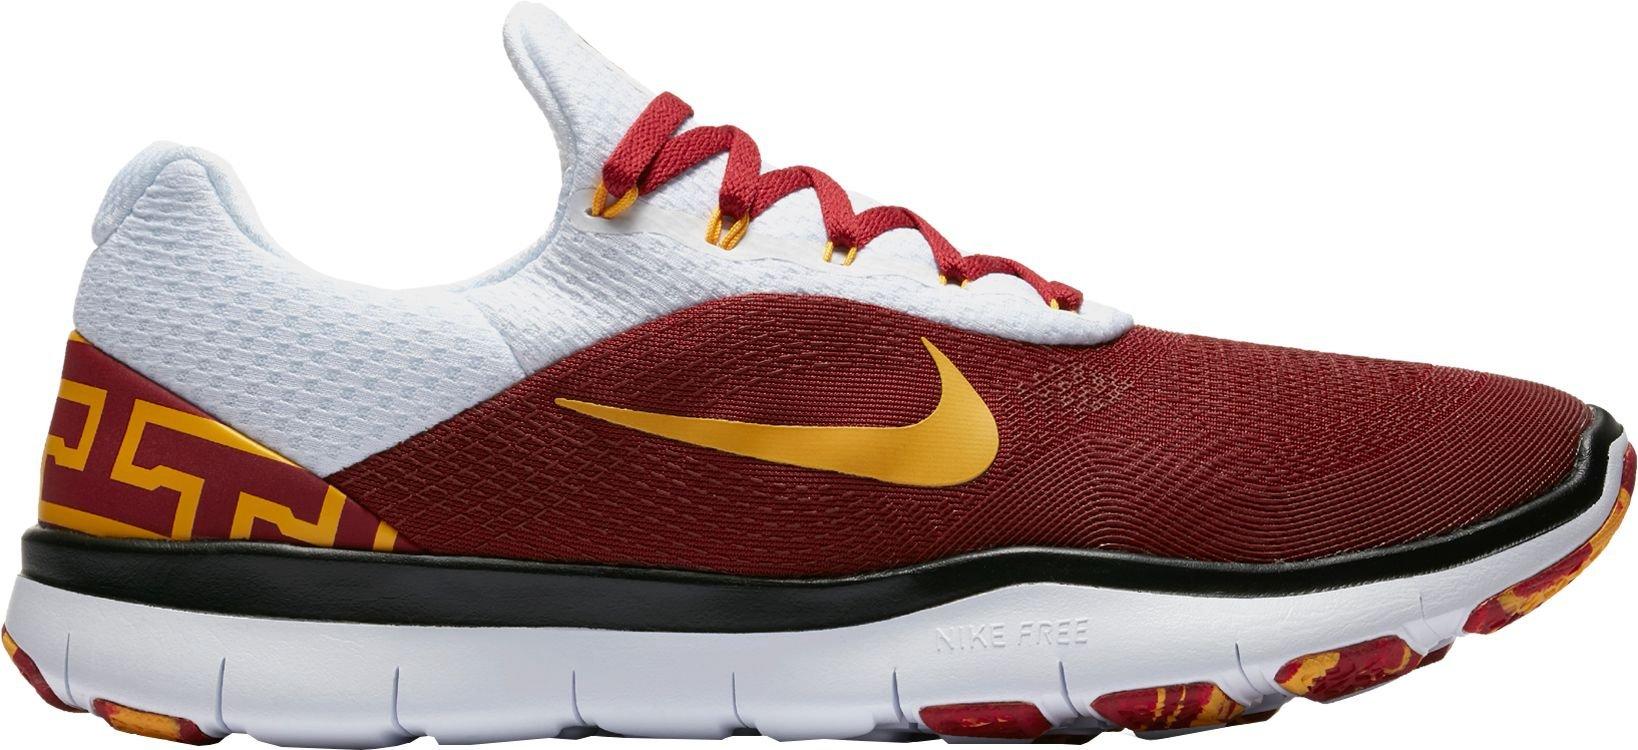 Nike Men's Free Trainer V7 Week Zero USC Edition Training Shoes